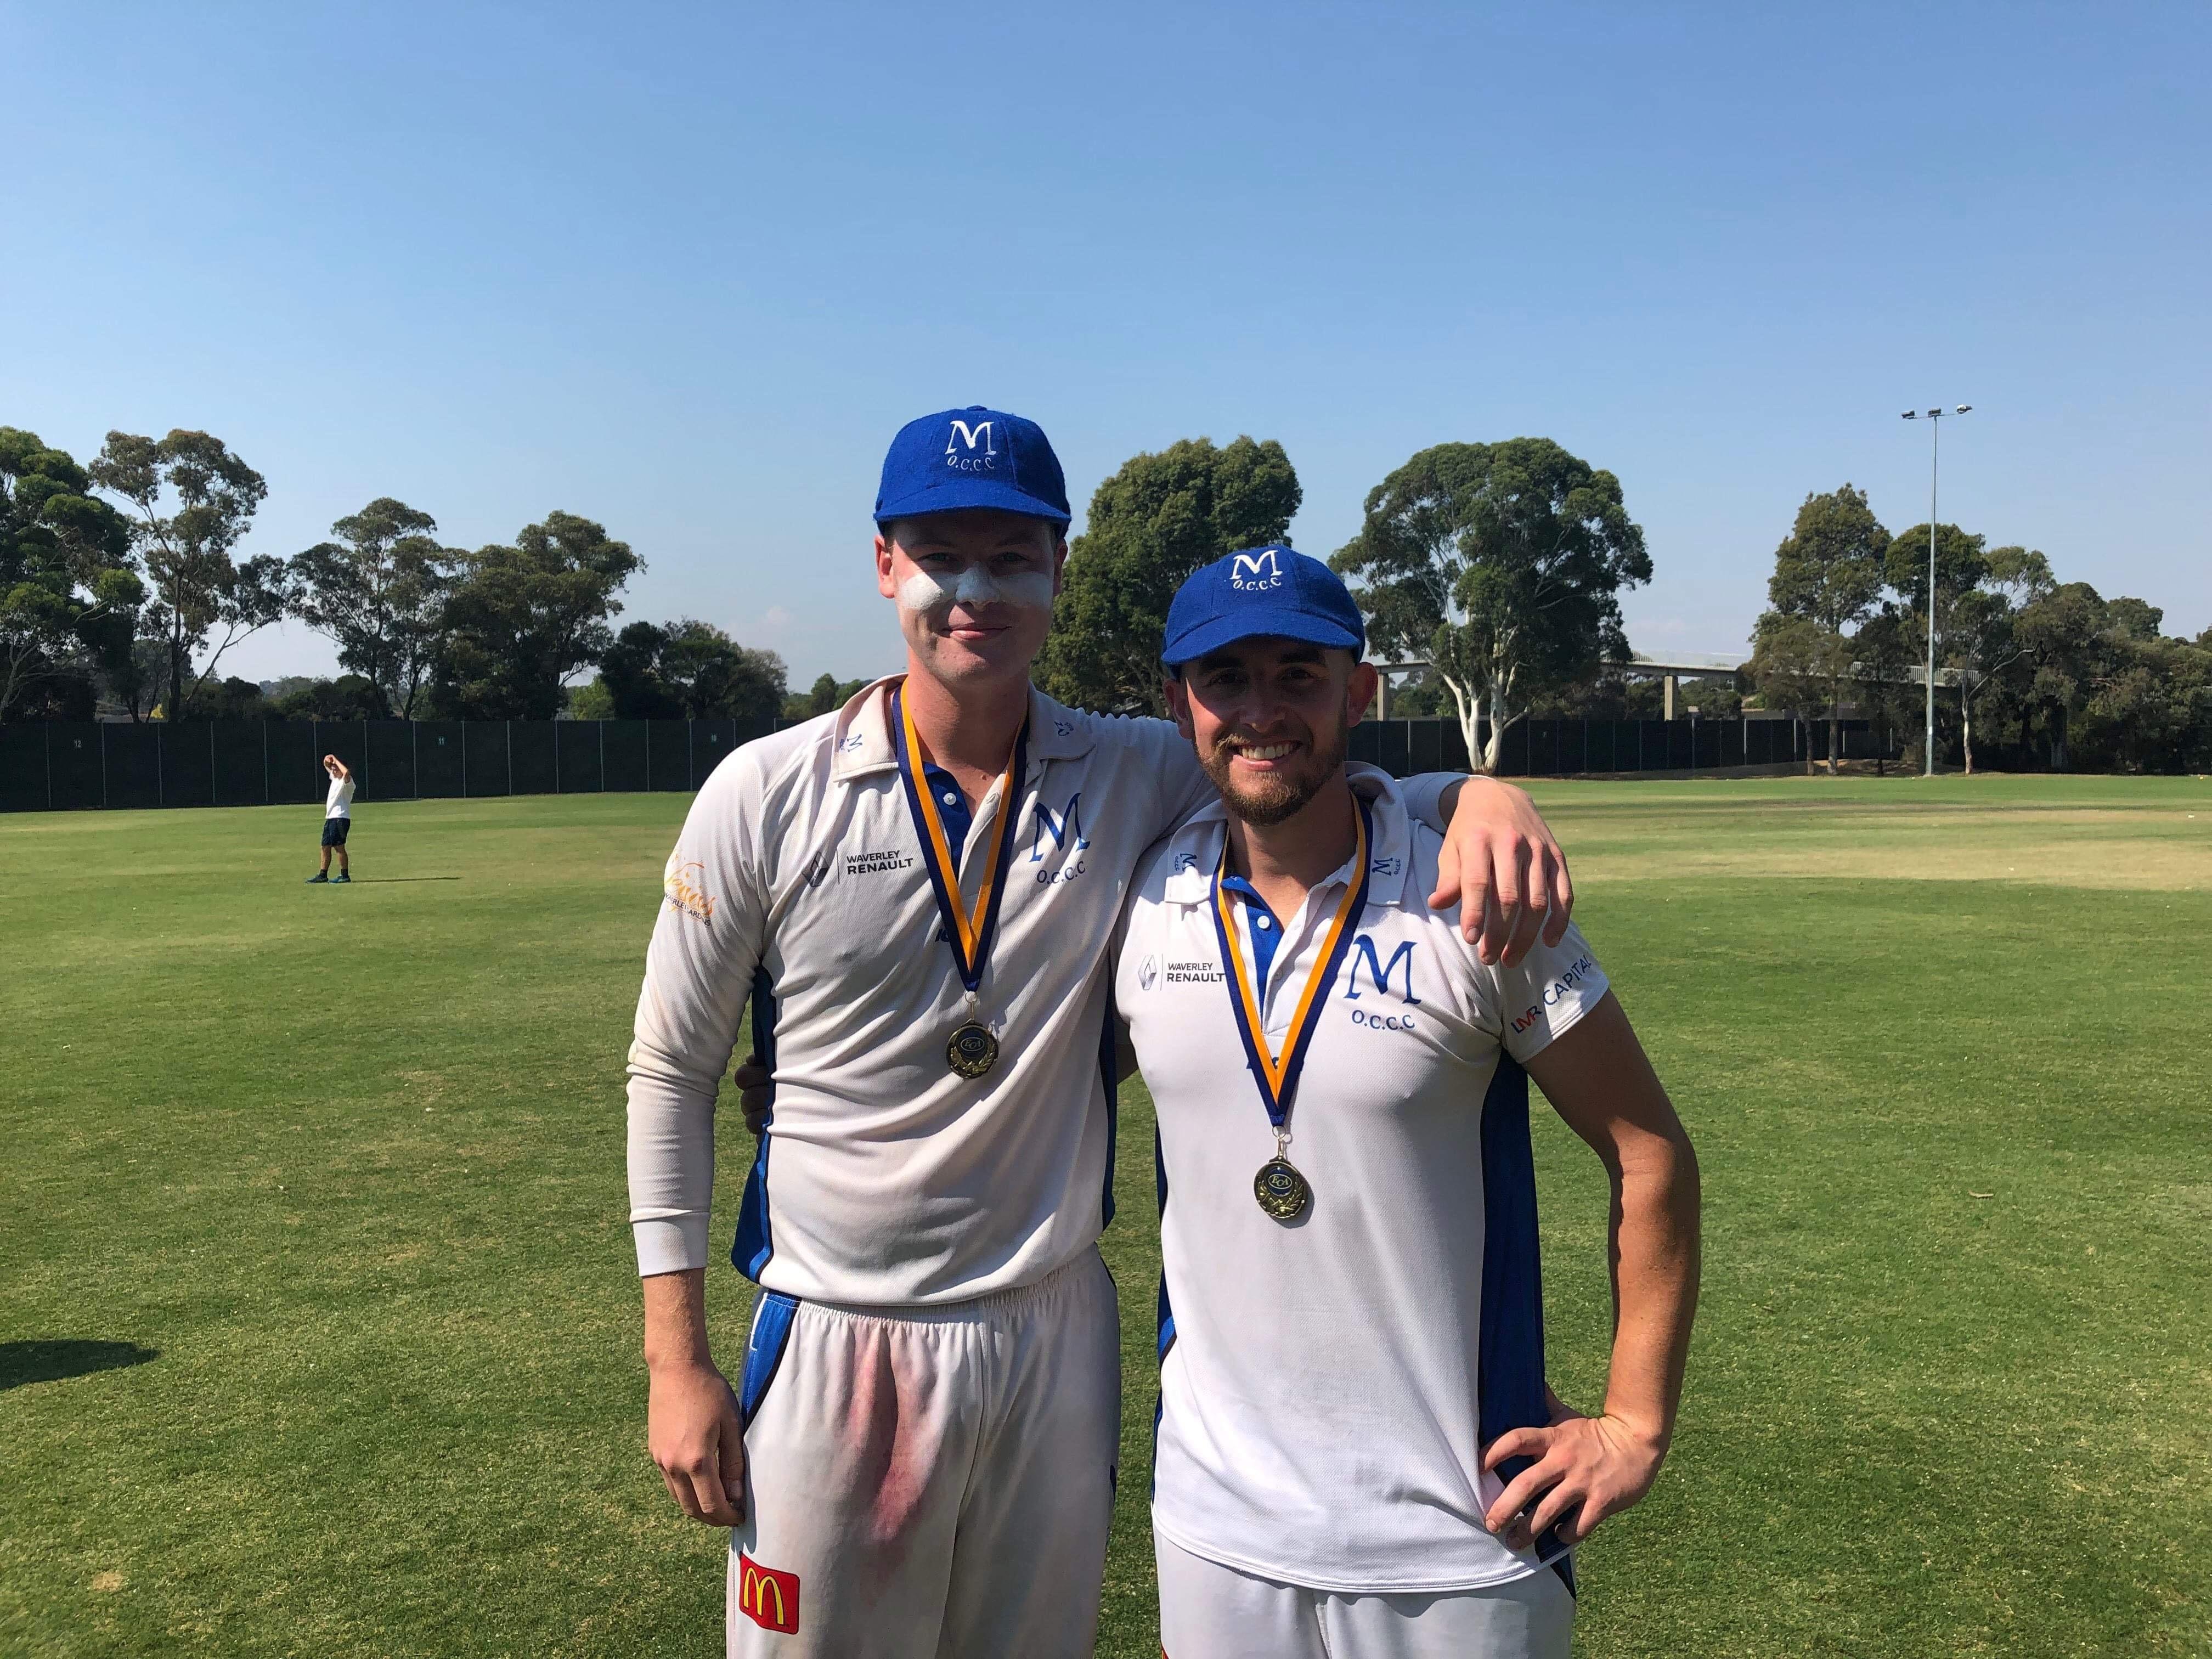 Success for Walmley Boys in Australia